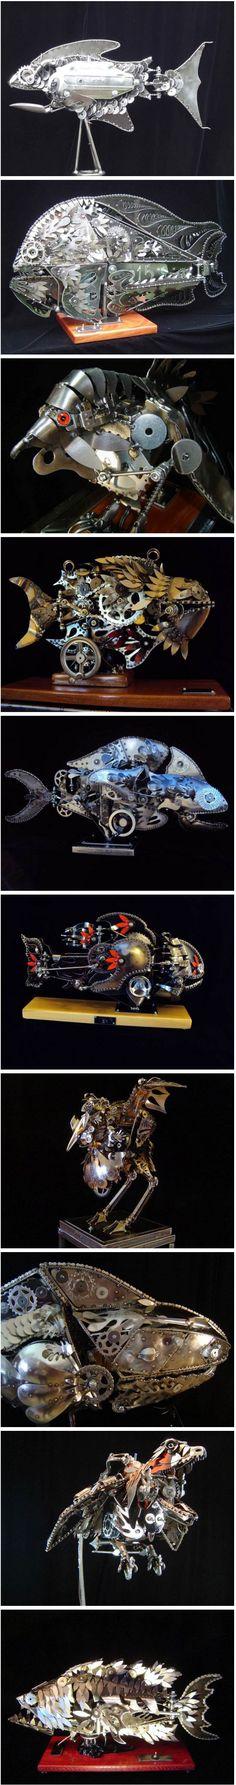 Industrial kinetic sculptures